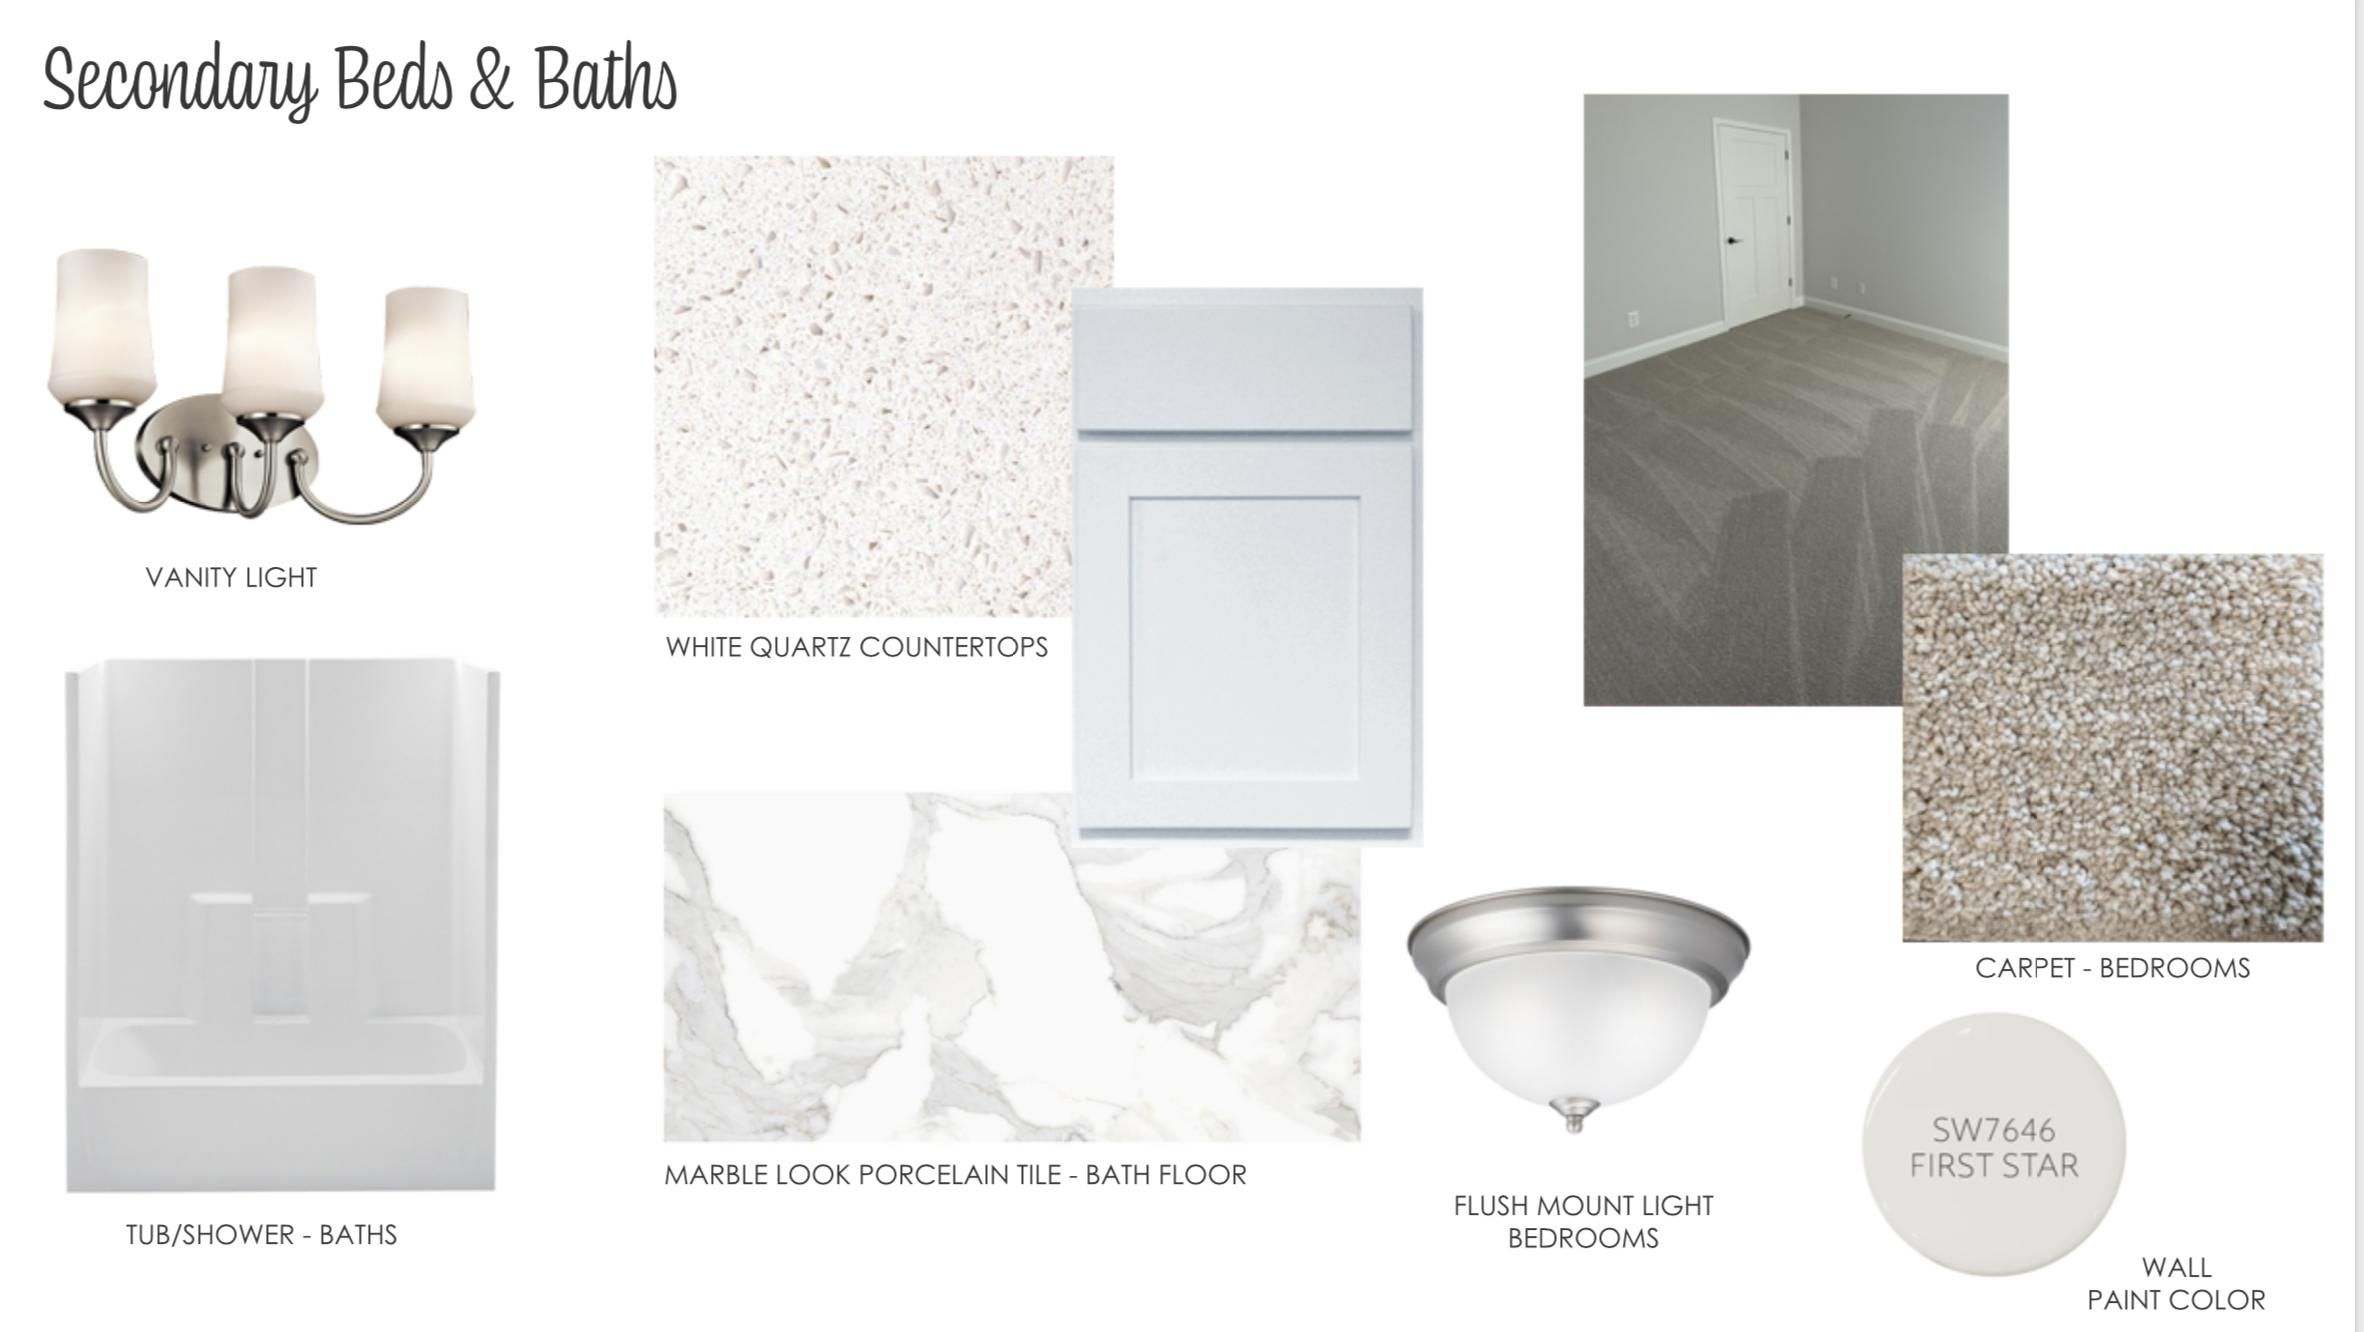 Secondary Beds:Baths SB1